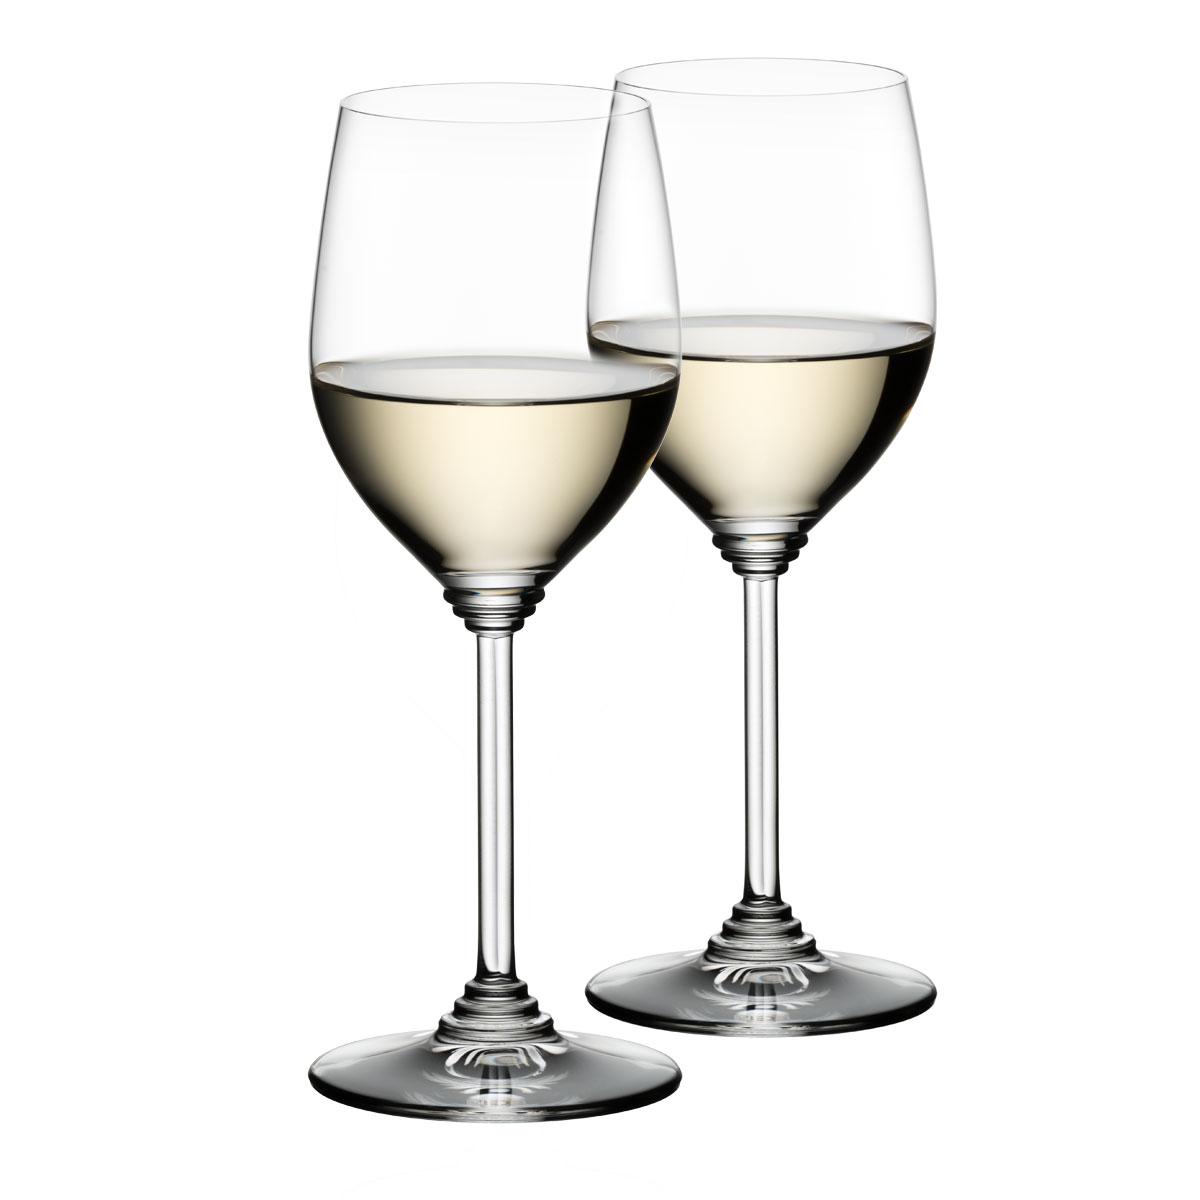 Riedel Wine, Viognier, Chardonnay Wine Glasses, Pair